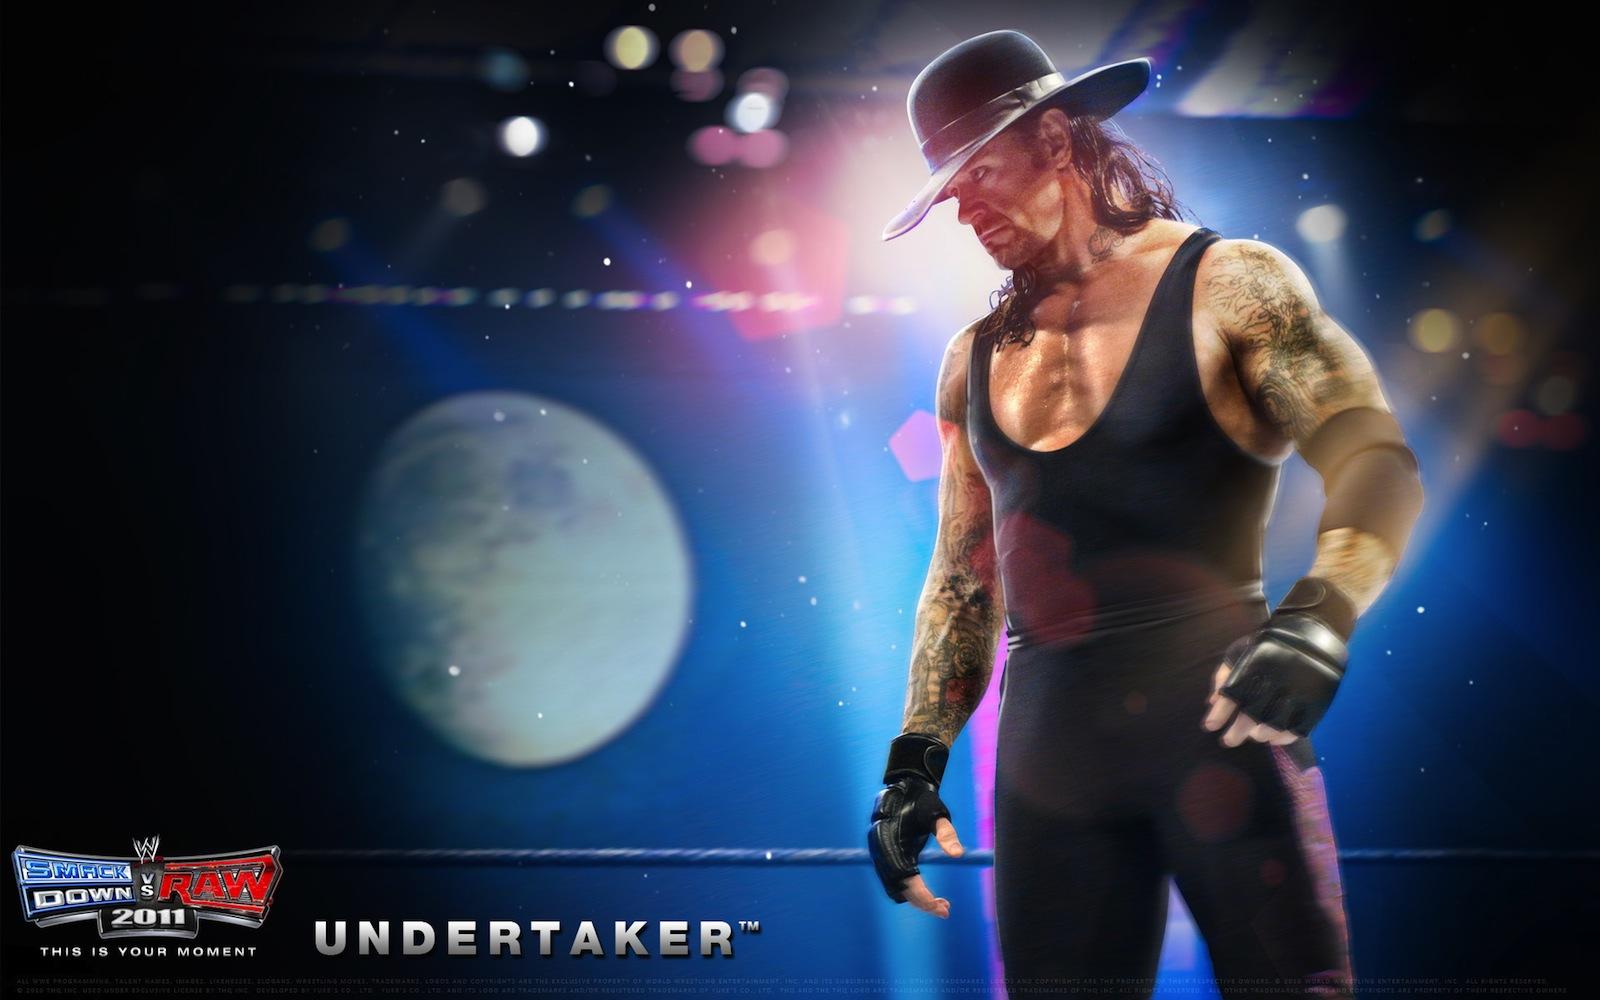 http://1.bp.blogspot.com/-IuXVQs6XT2A/T_k-YmABJ_I/AAAAAAAAA7U/9FkAc4AphzM/s1600/wwe-smackdown-vs-raw-2011-undertaker-wallpaper.jpg